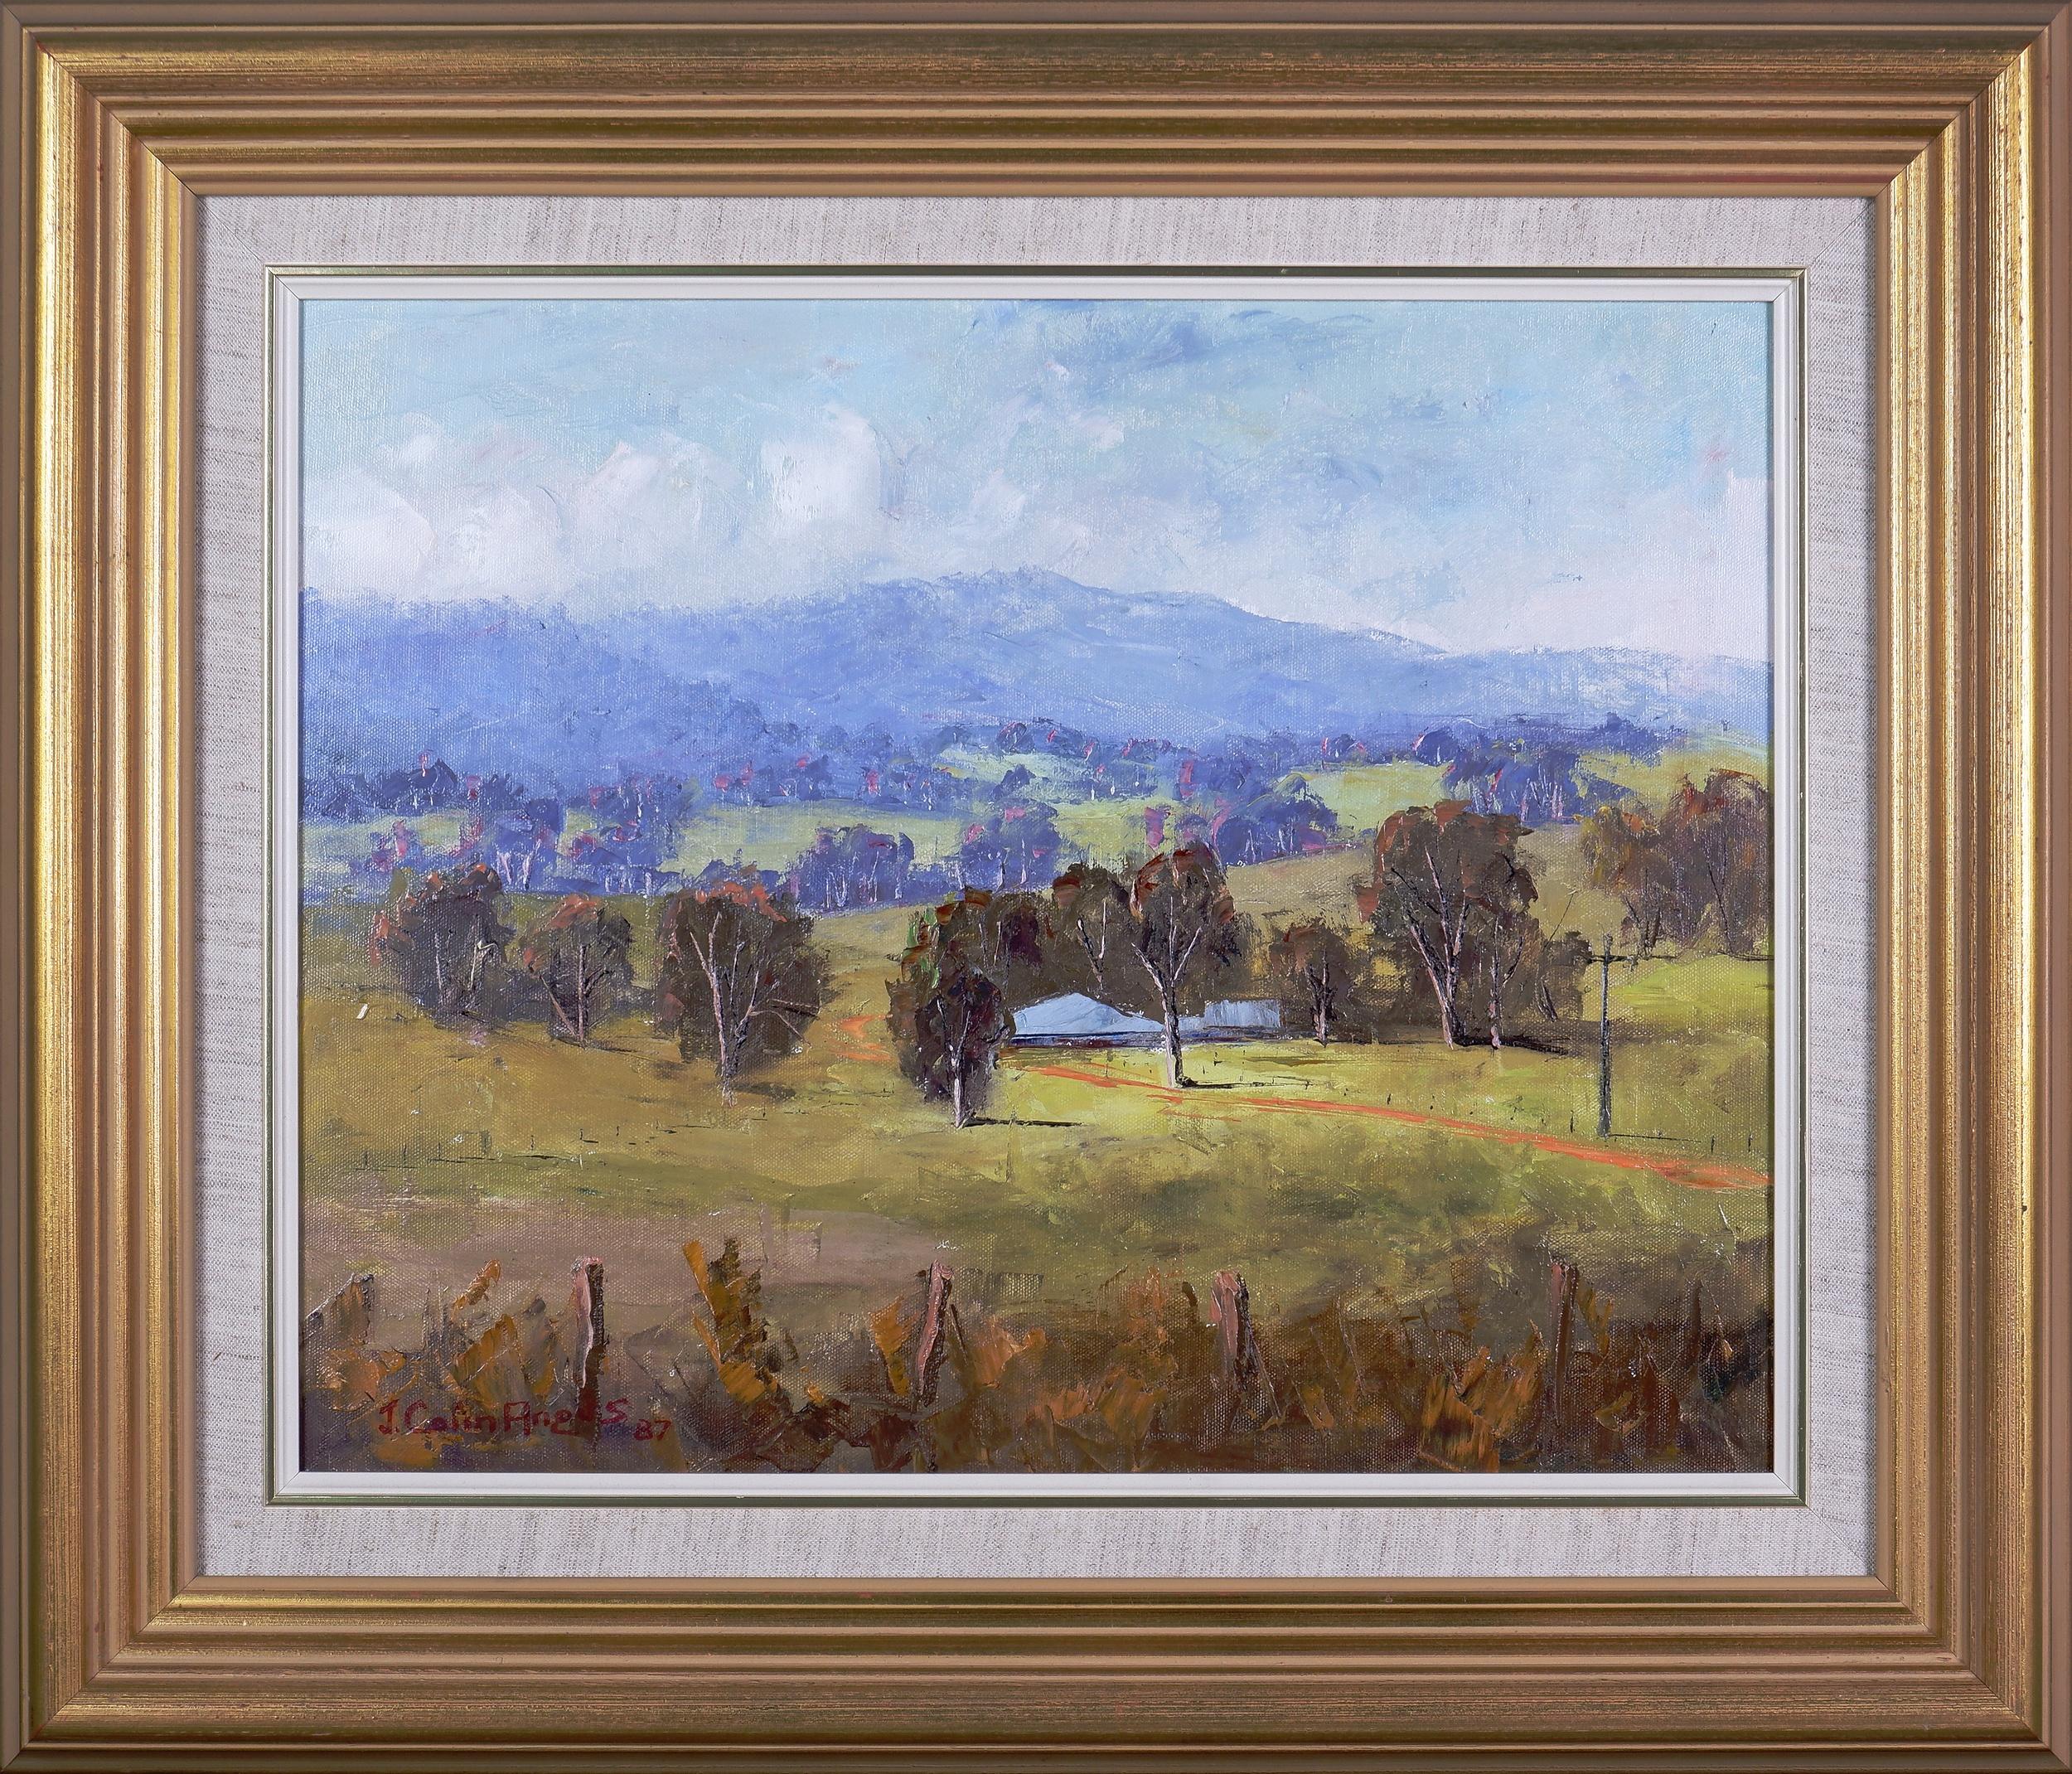 'J. Colin Angus (1907-2002), Baranduda Pastoral 1987, Oil on Canvas on Board'